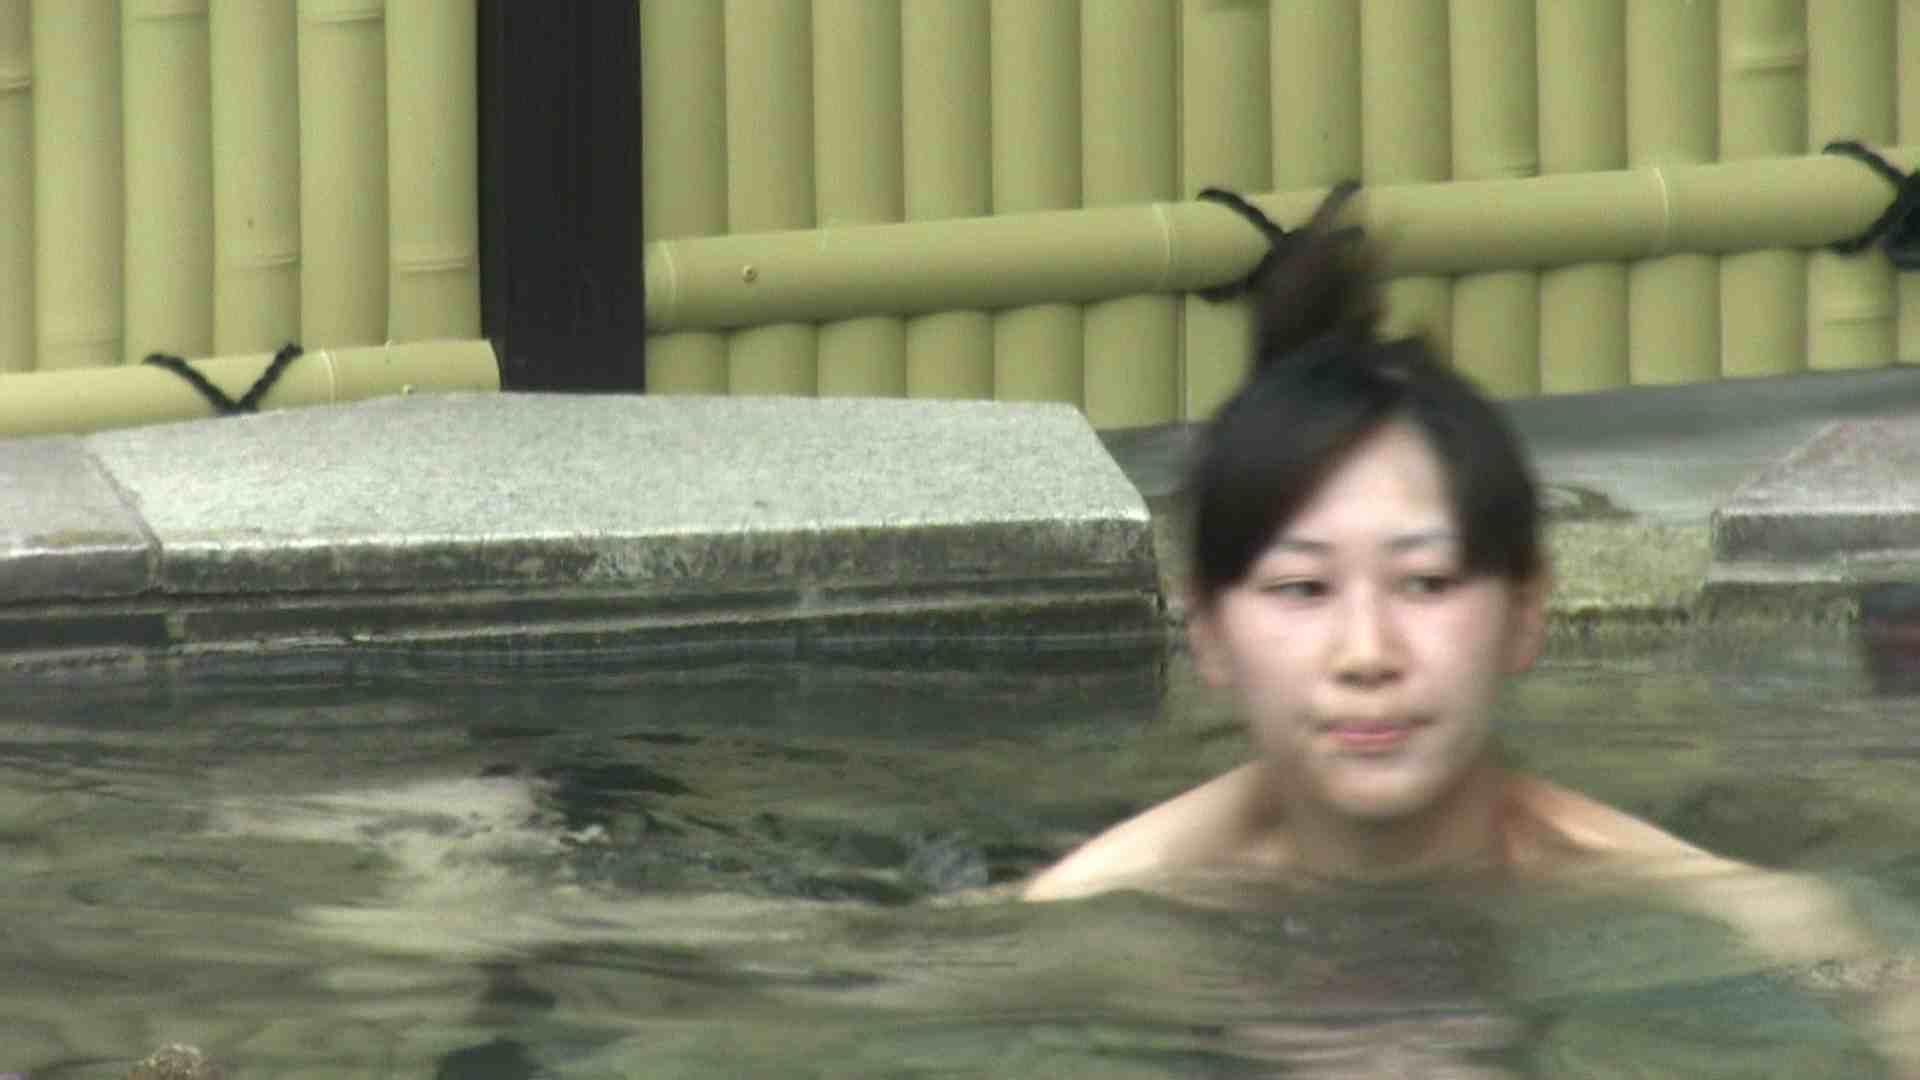 Aquaな露天風呂Vol.665 露天 アダルト動画キャプチャ 85枚 59